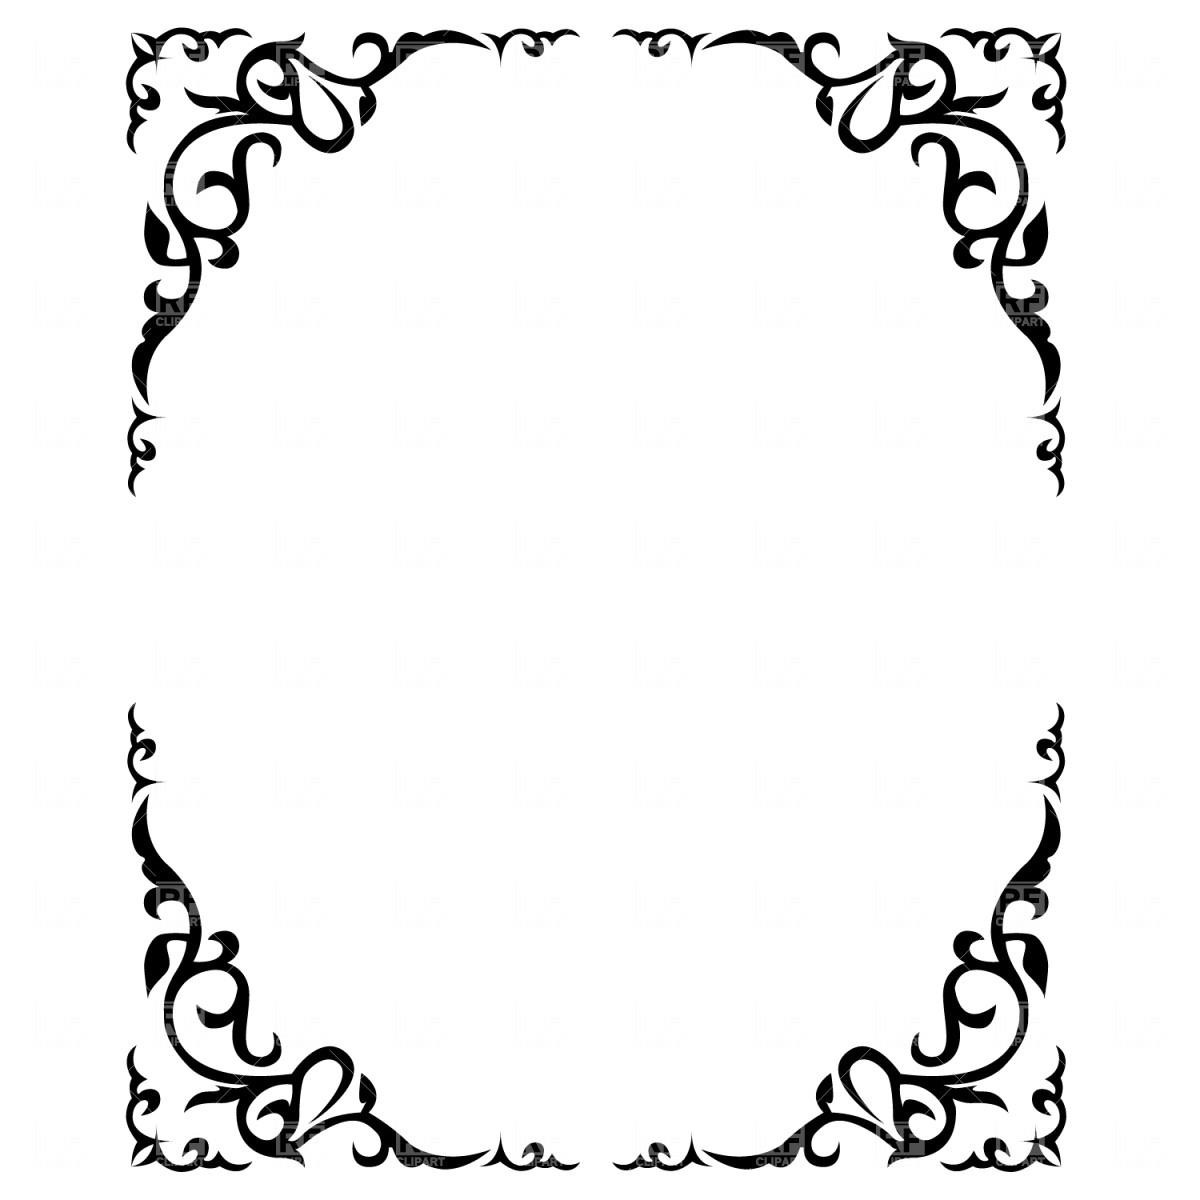 1200x1200 Ornate Floral Frame Download Royalty Free Vector File Eps 2496 12